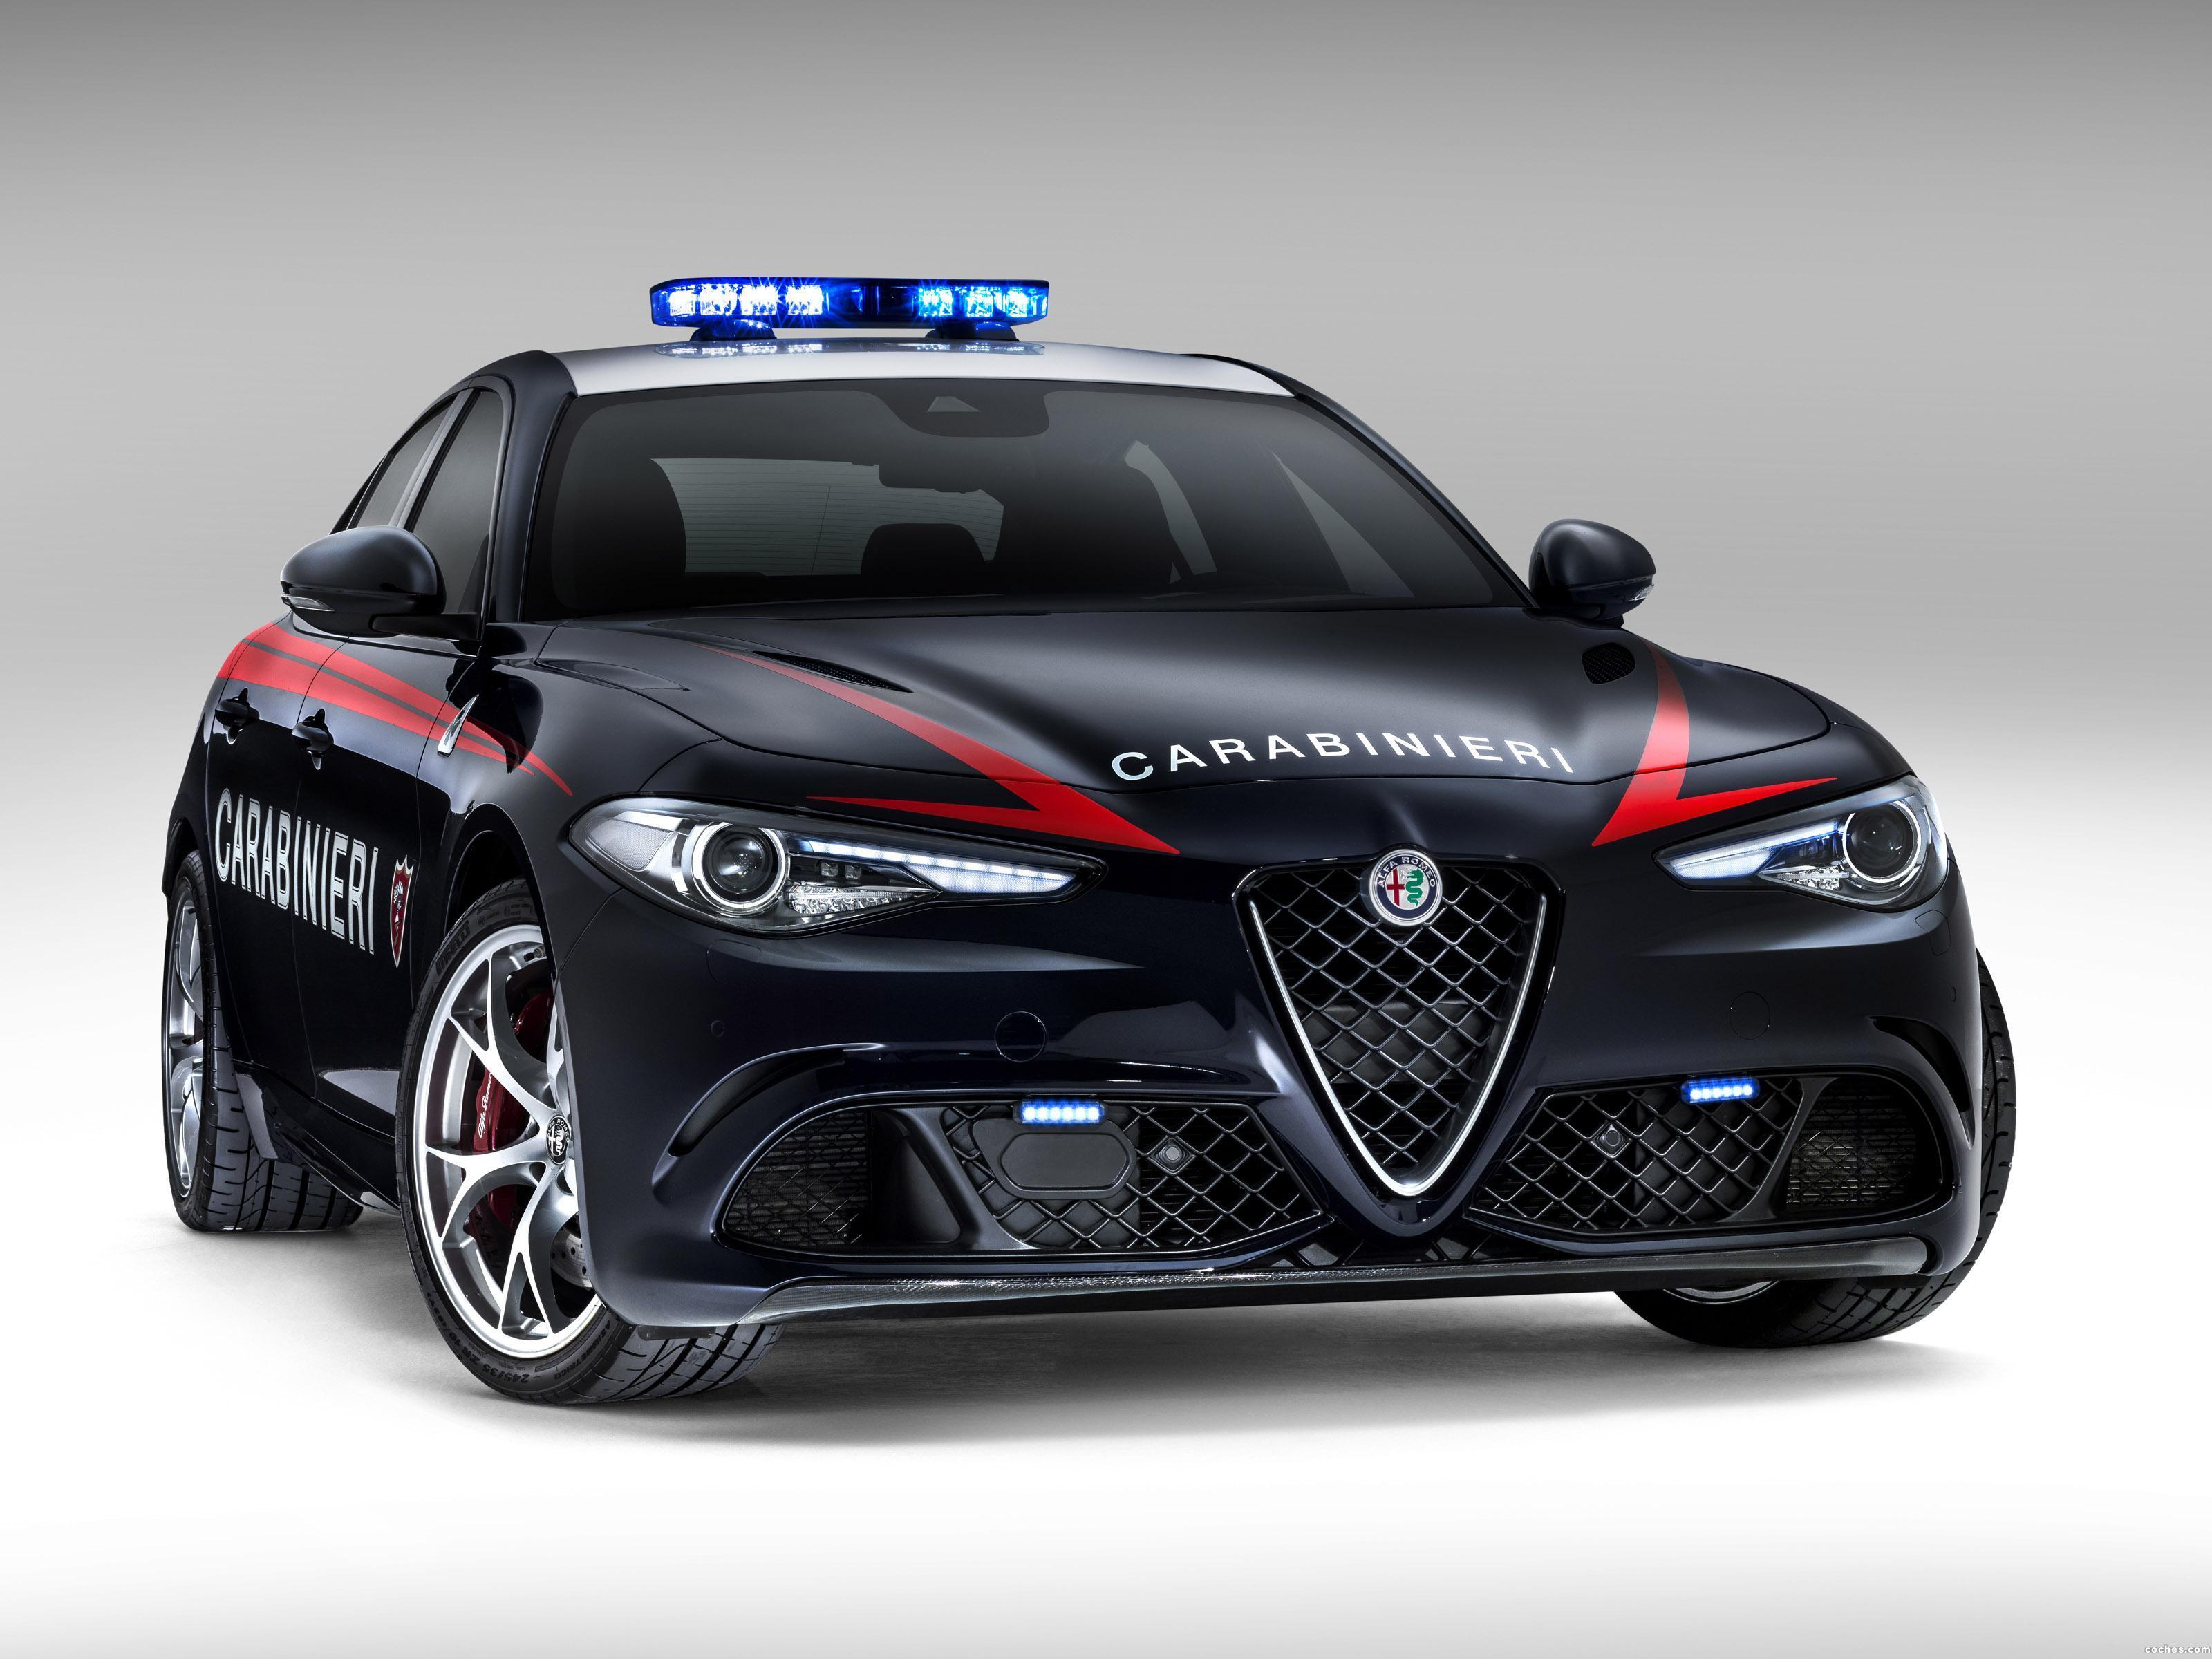 Foto 0 de Alfa Romeo Giulia Quadrifoglio Verde Carabinieri 2016